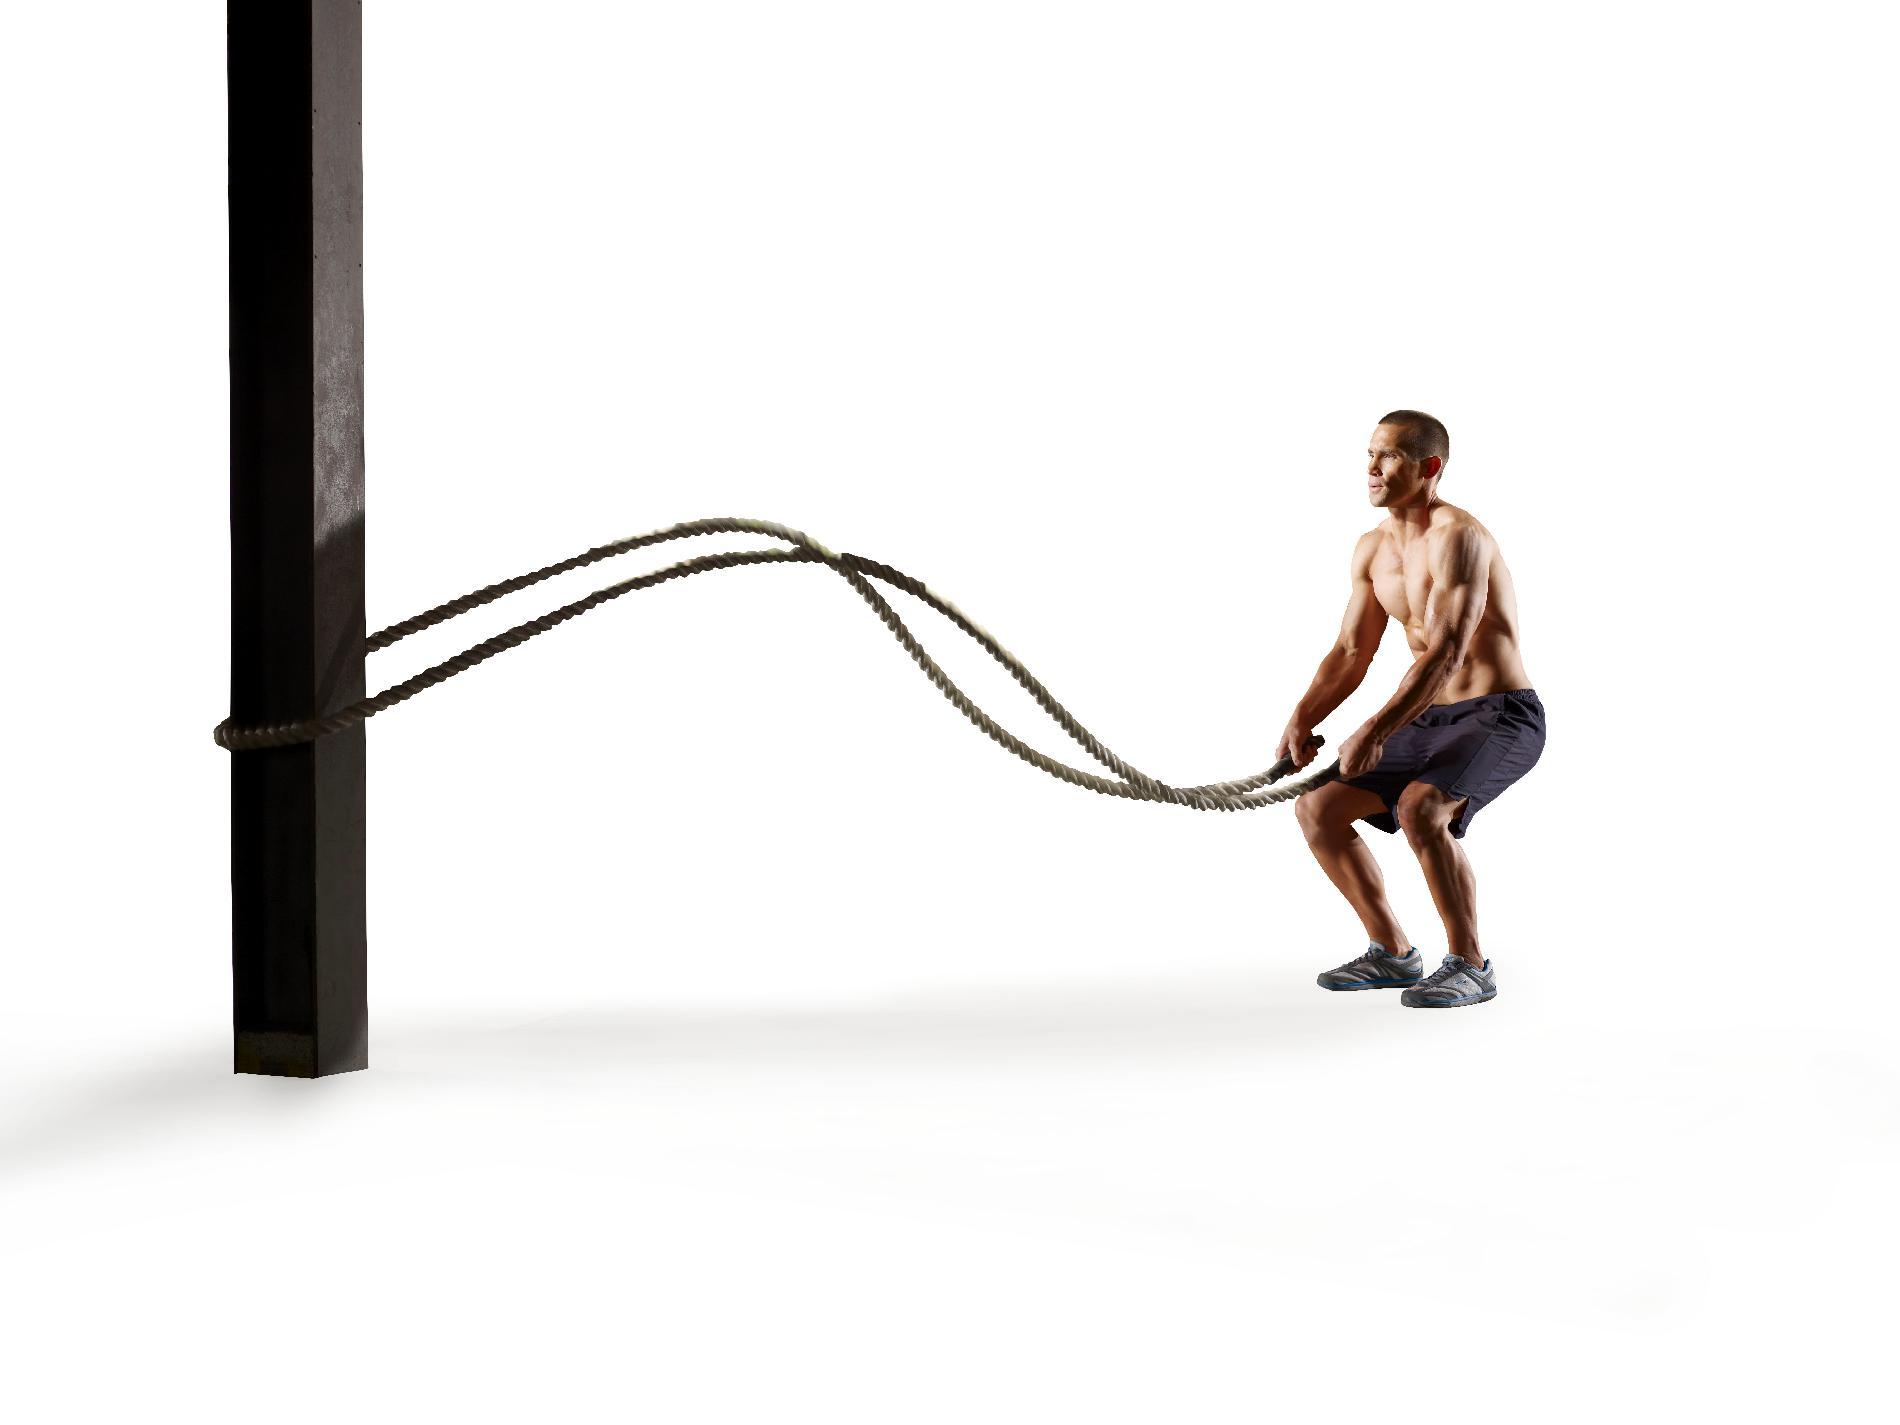 Weider 20 Foot Training Rope